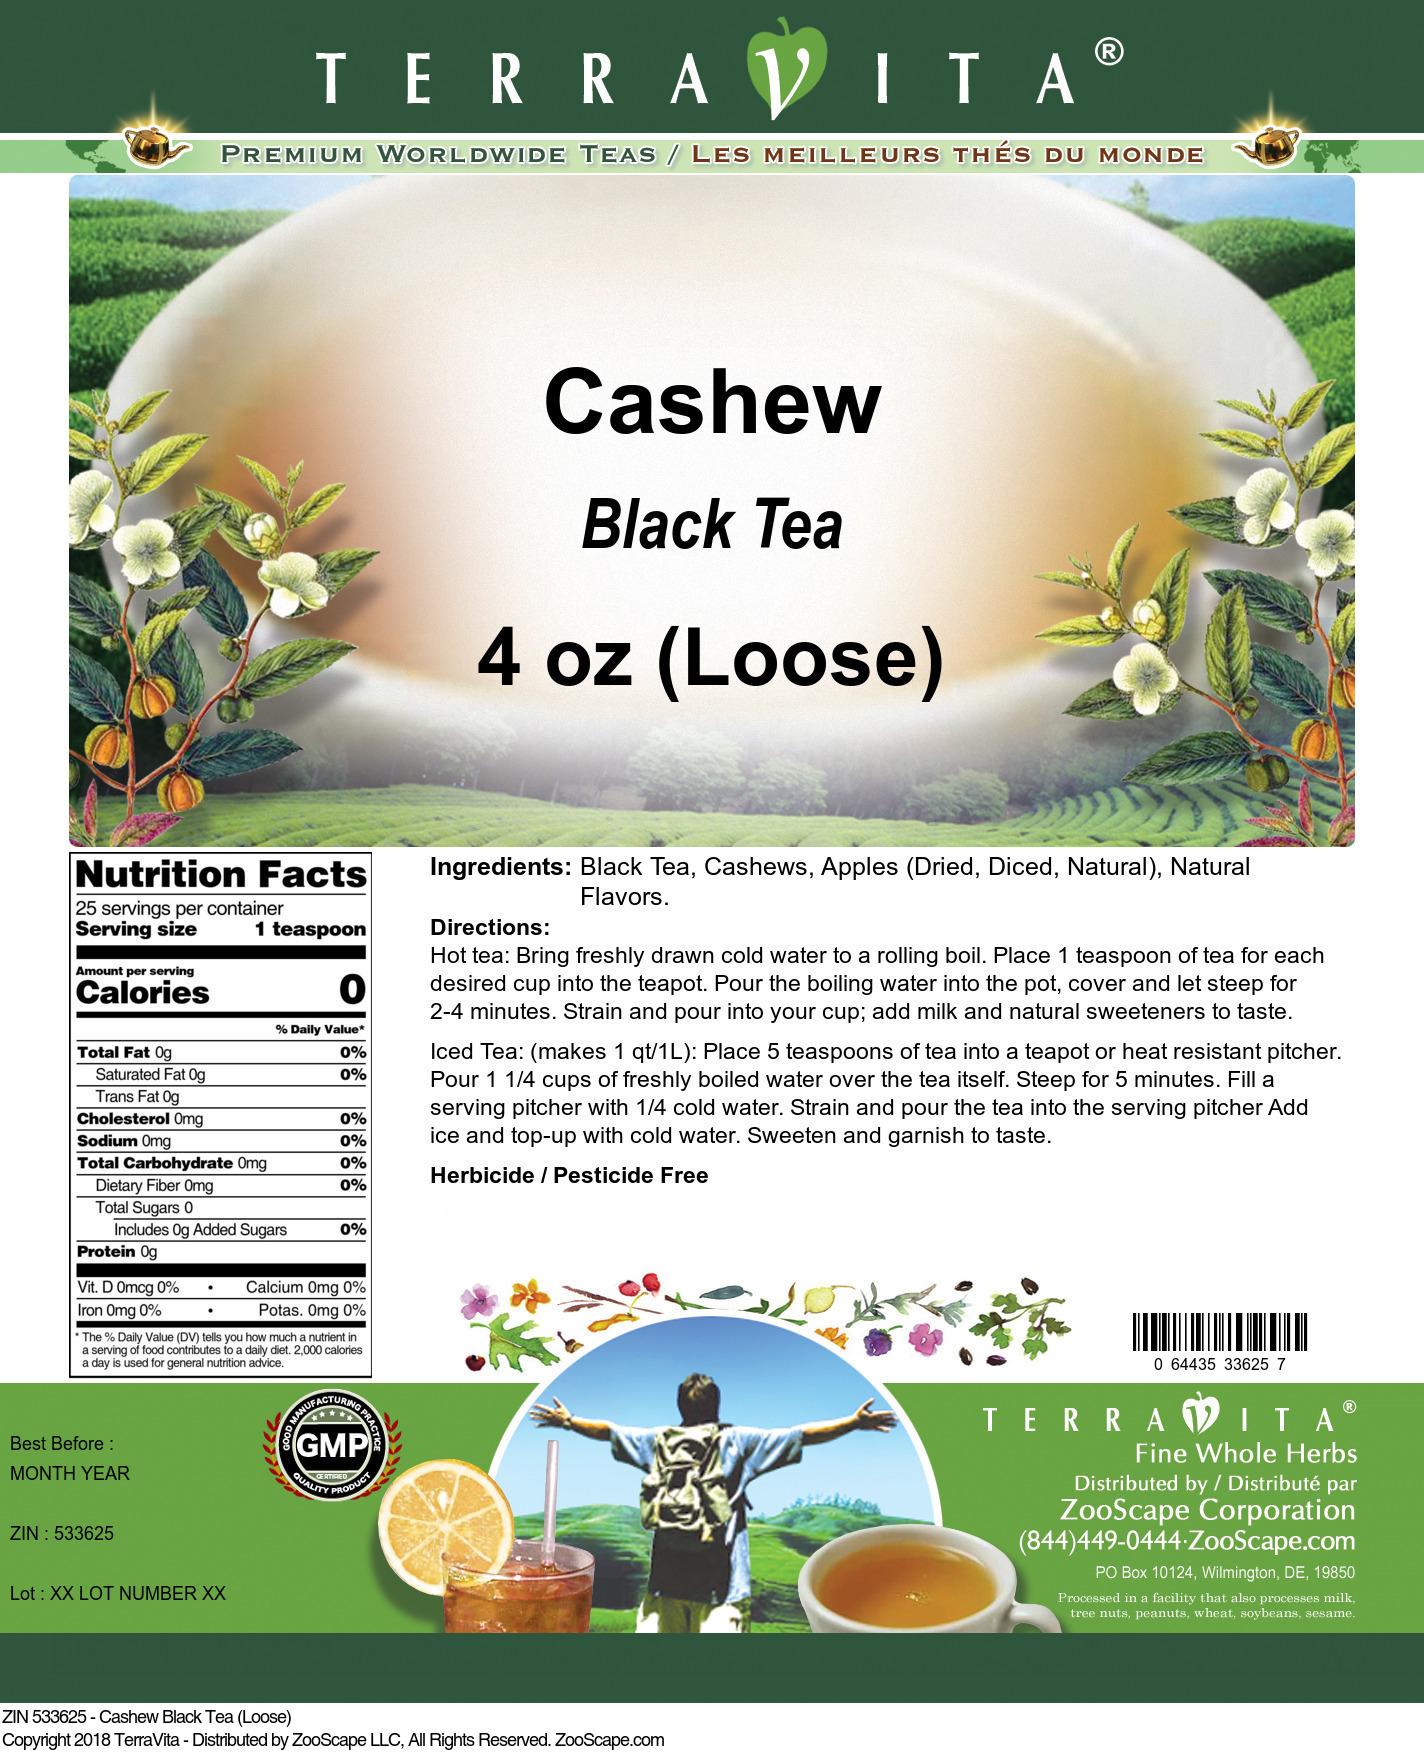 Cashew Black Tea (Loose)